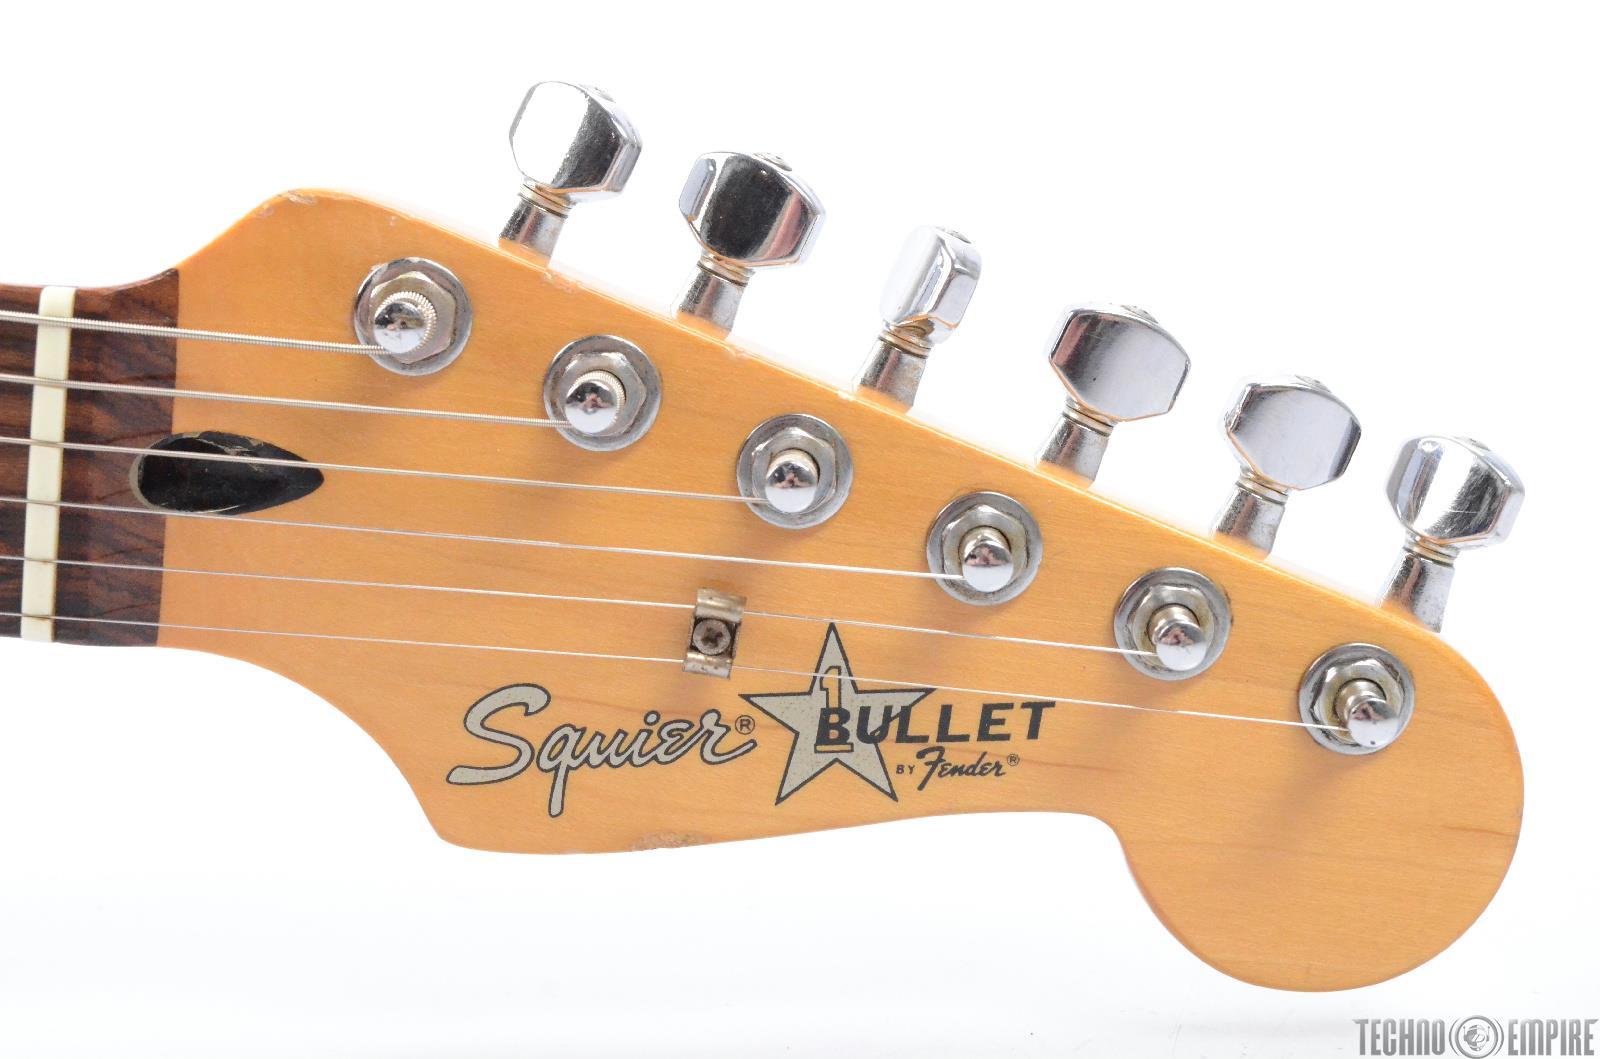 1987 fender squier bullet 1 e7 hss electric guitar w gig bag 27334